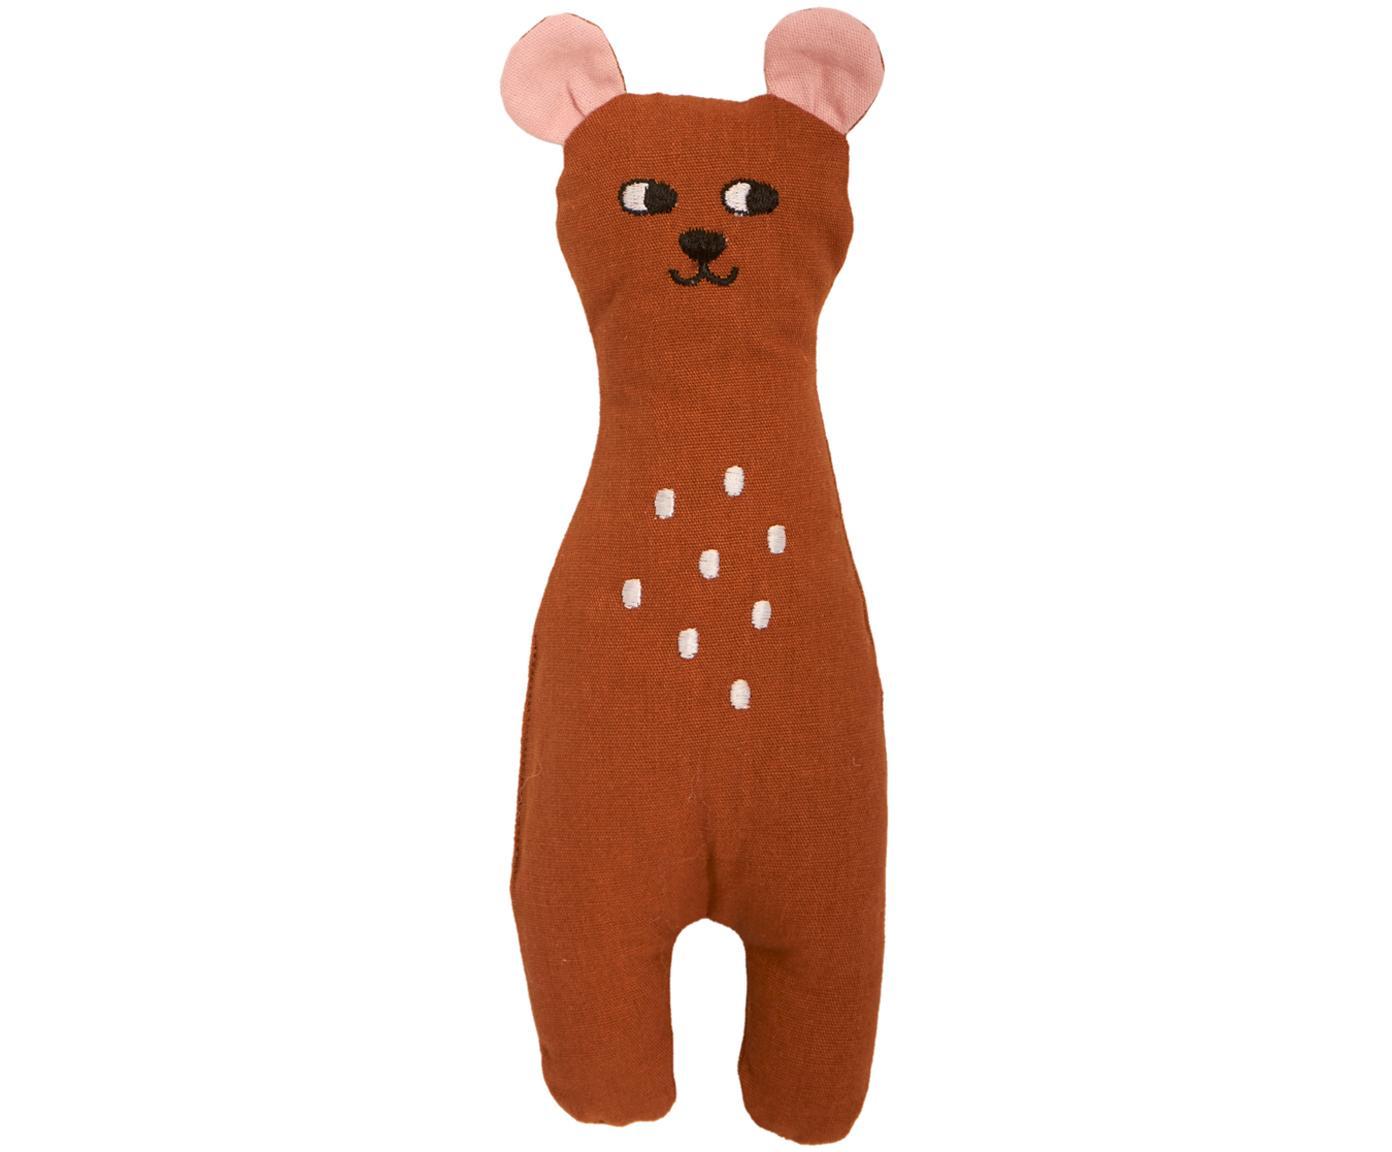 Knuffeldier Bear, Bruin, 8 x 25 cm